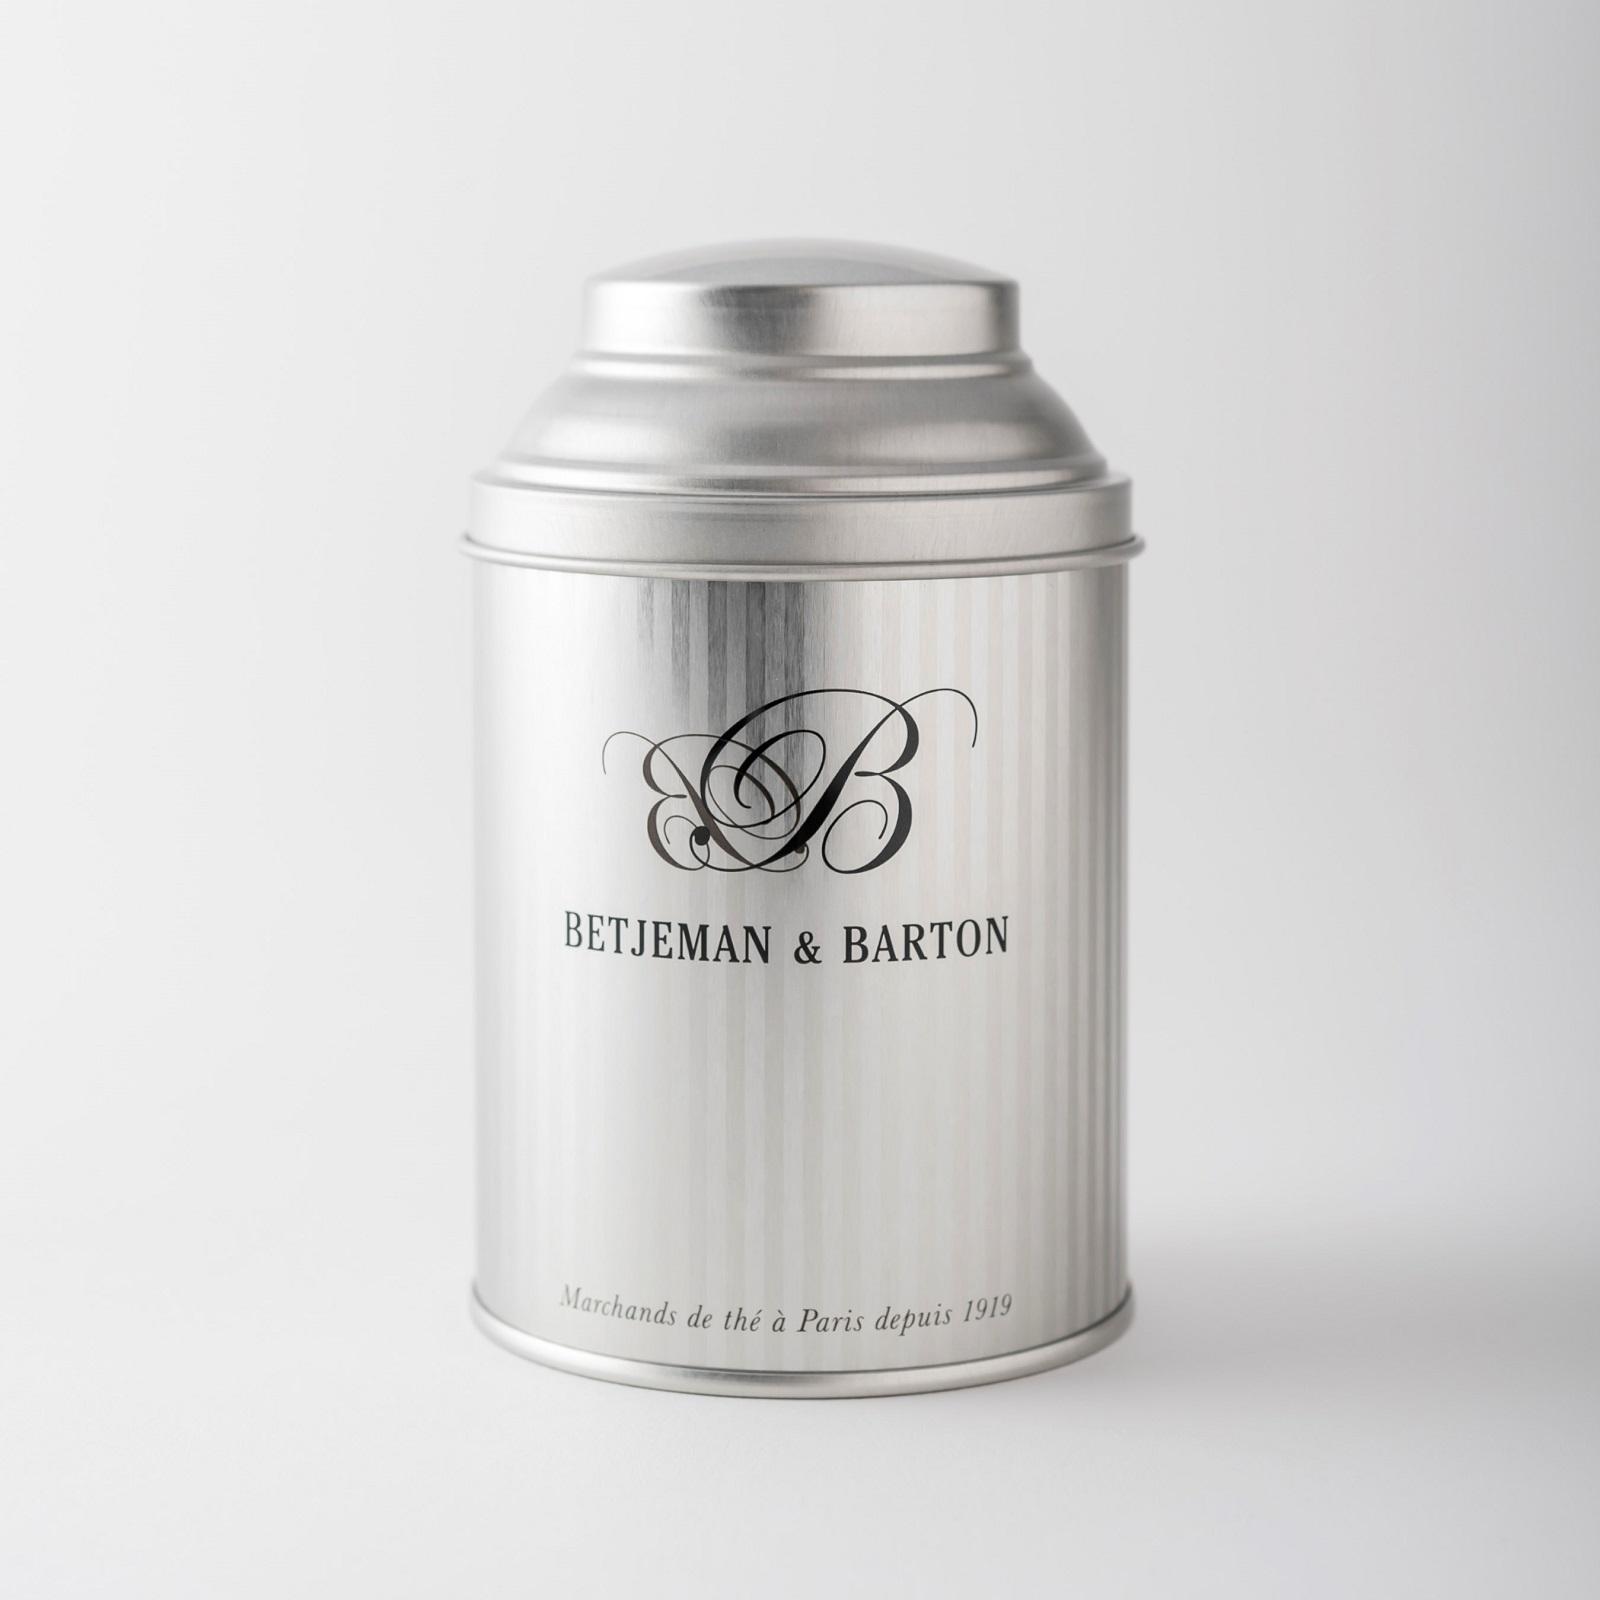 Sanit Geran サンジュラン 70g缶